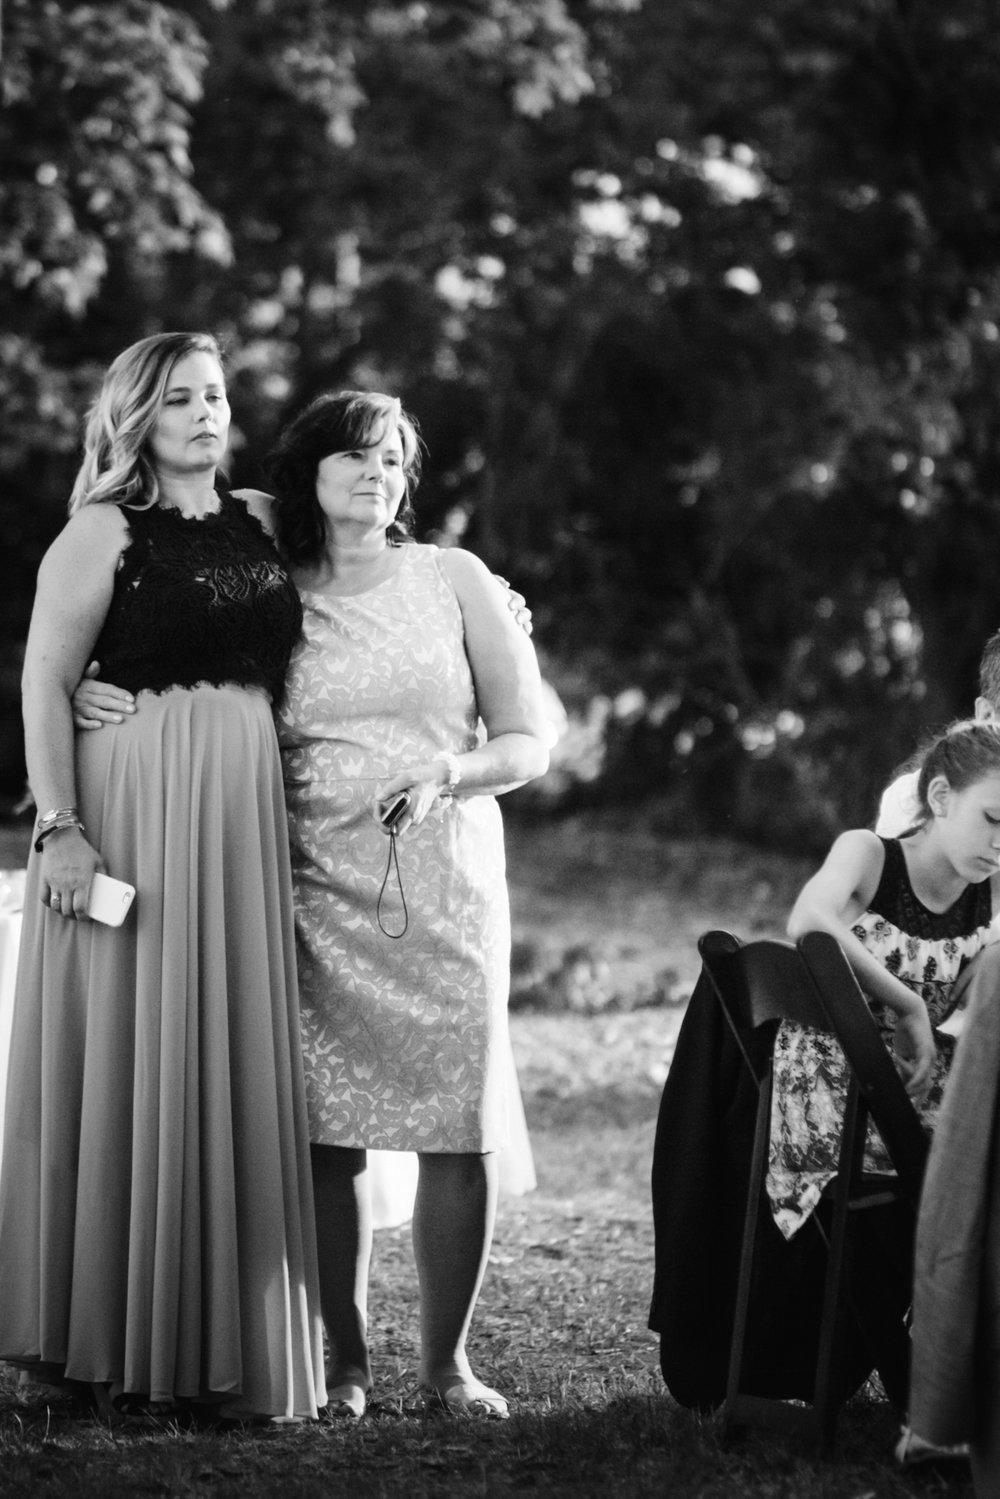 Kimberly-Coccagnia-Wedding-Photographer-229.JPG